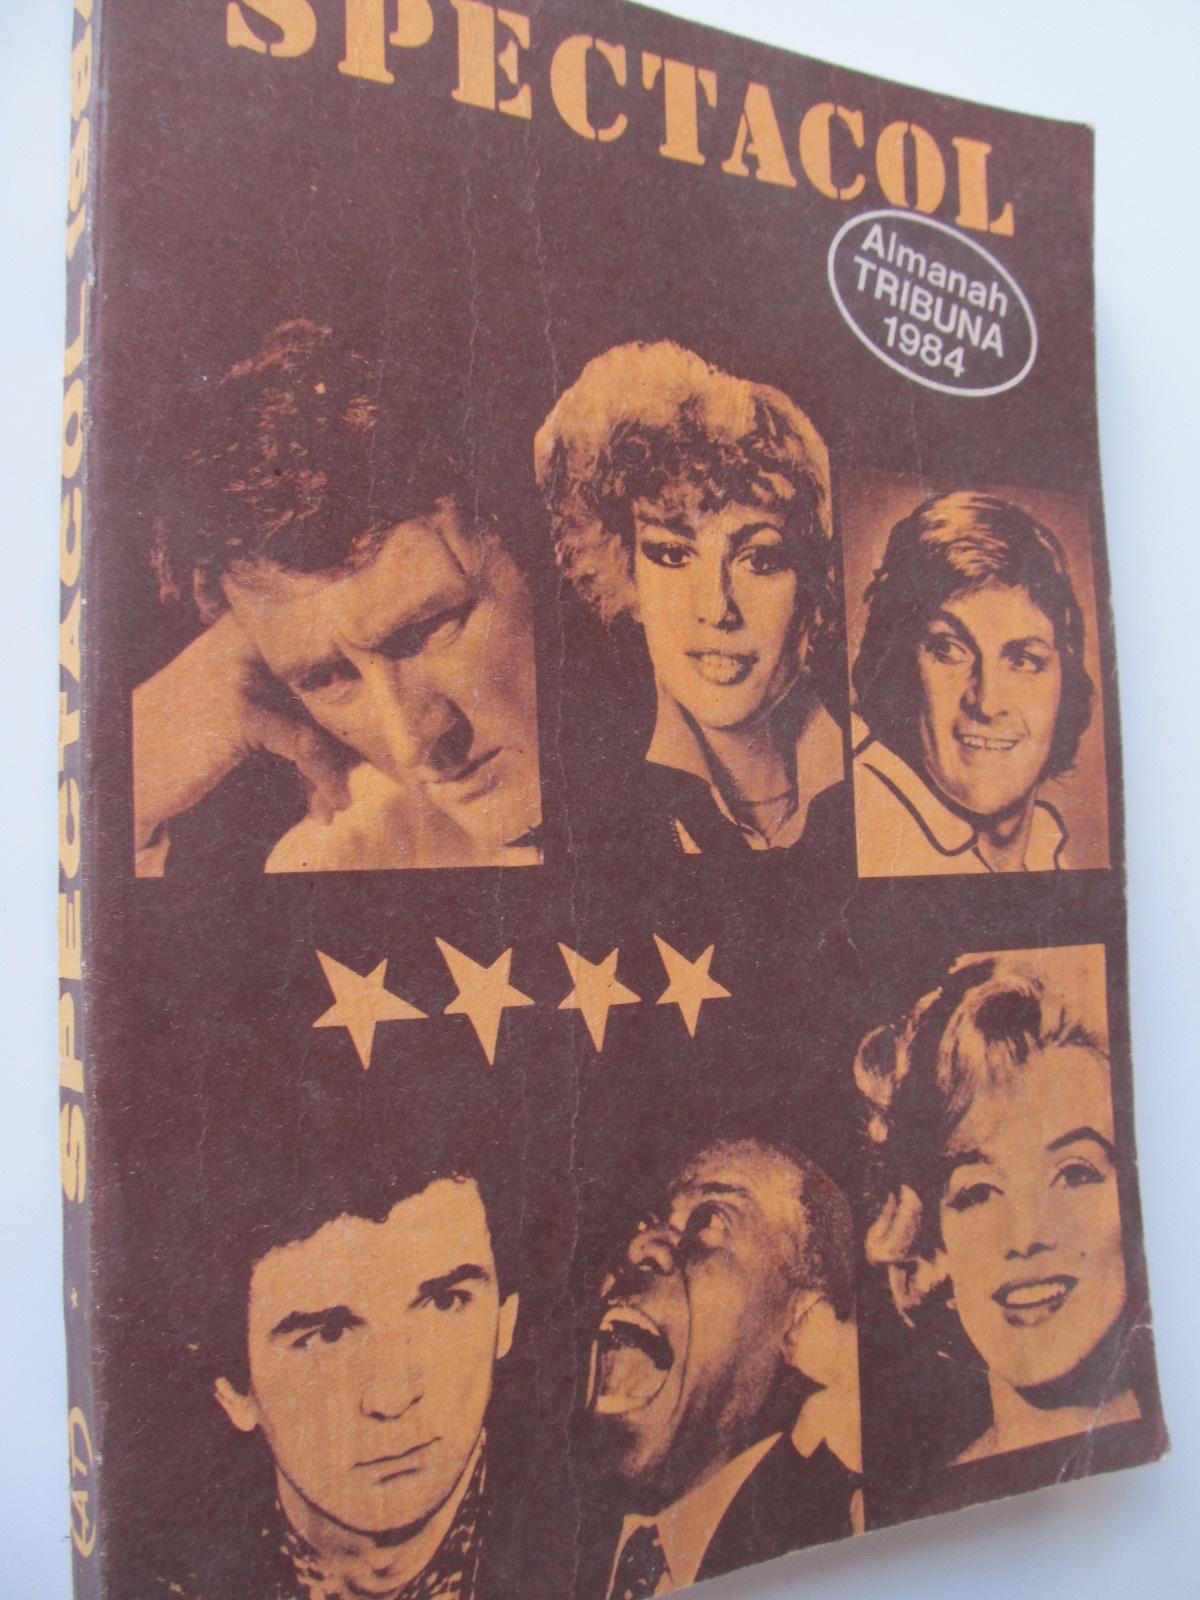 Spectacol - Almanah Tribuna 1984 - *** | Detalii carte